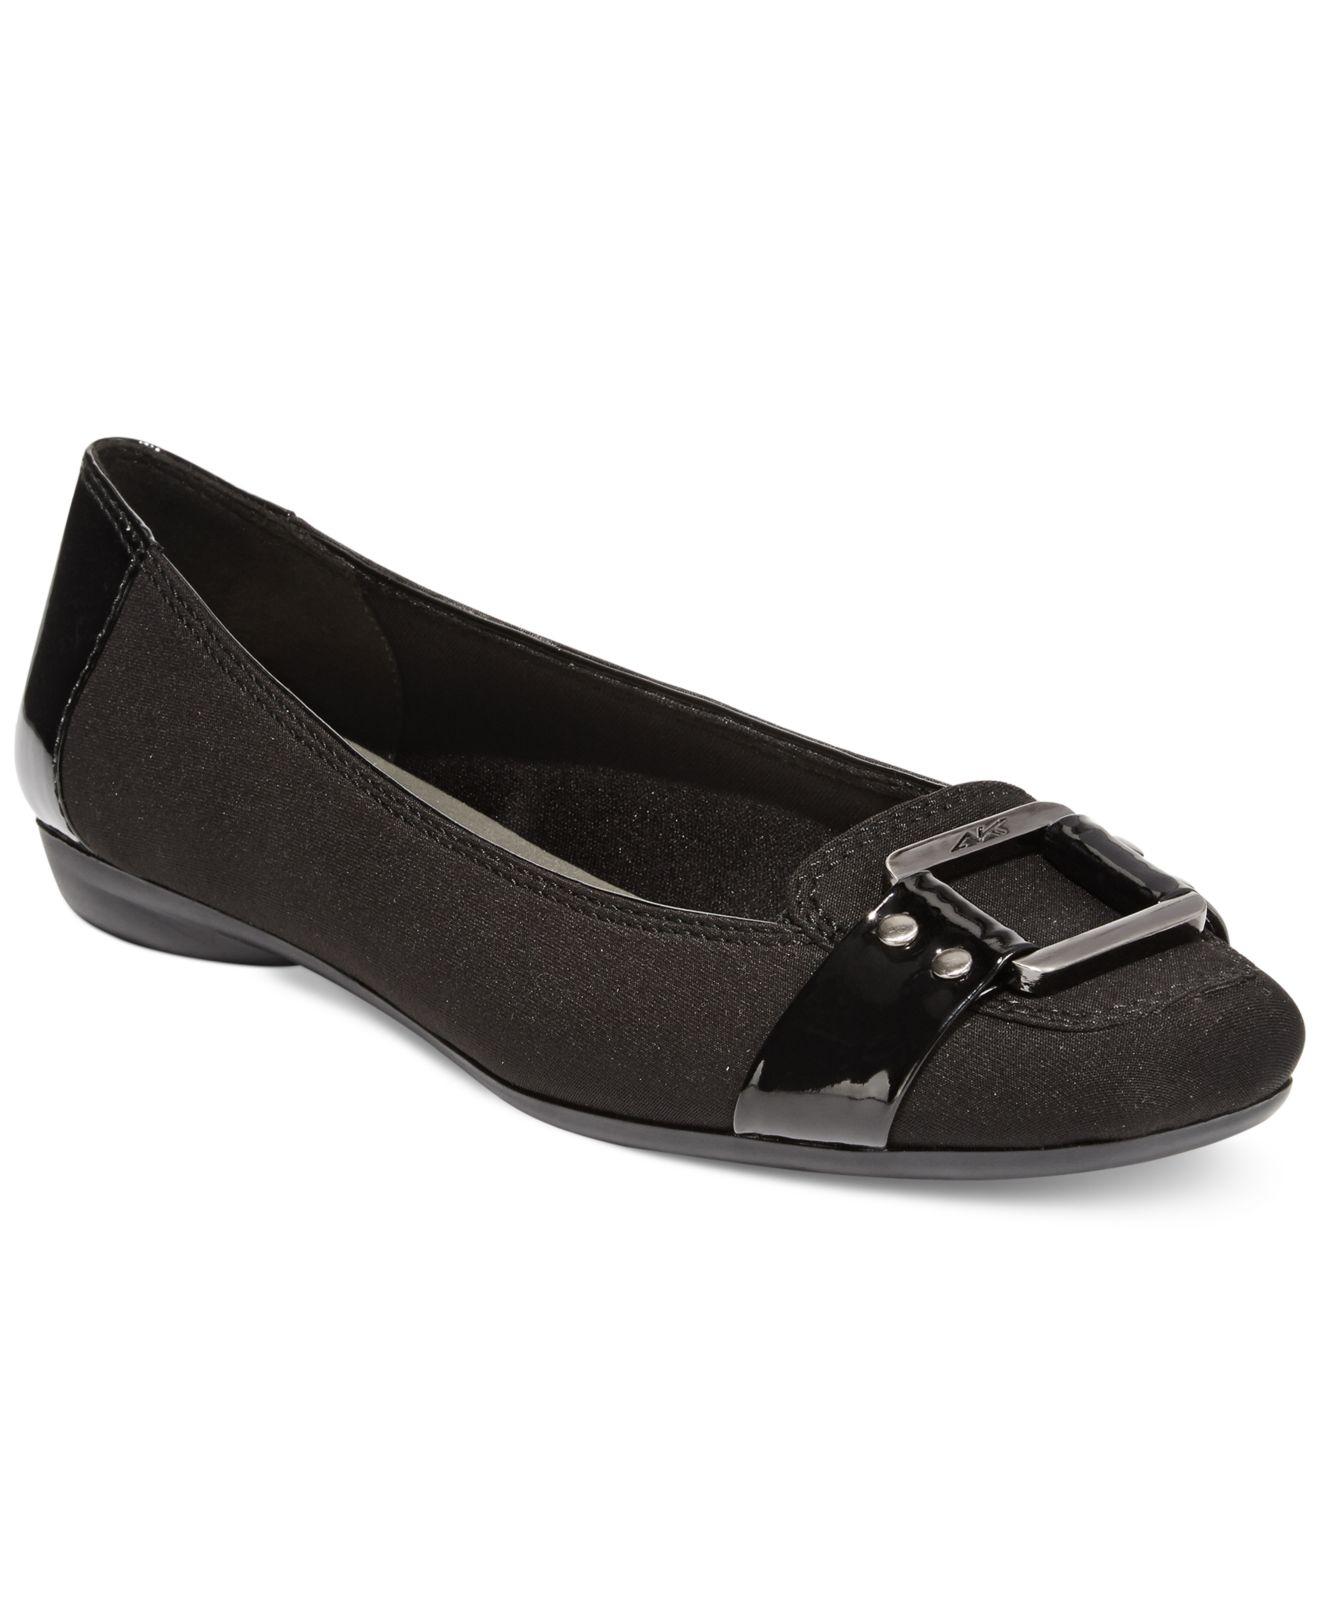 Anne Klein Able Ballet Flat Shoe Wide Width in Blue - Save